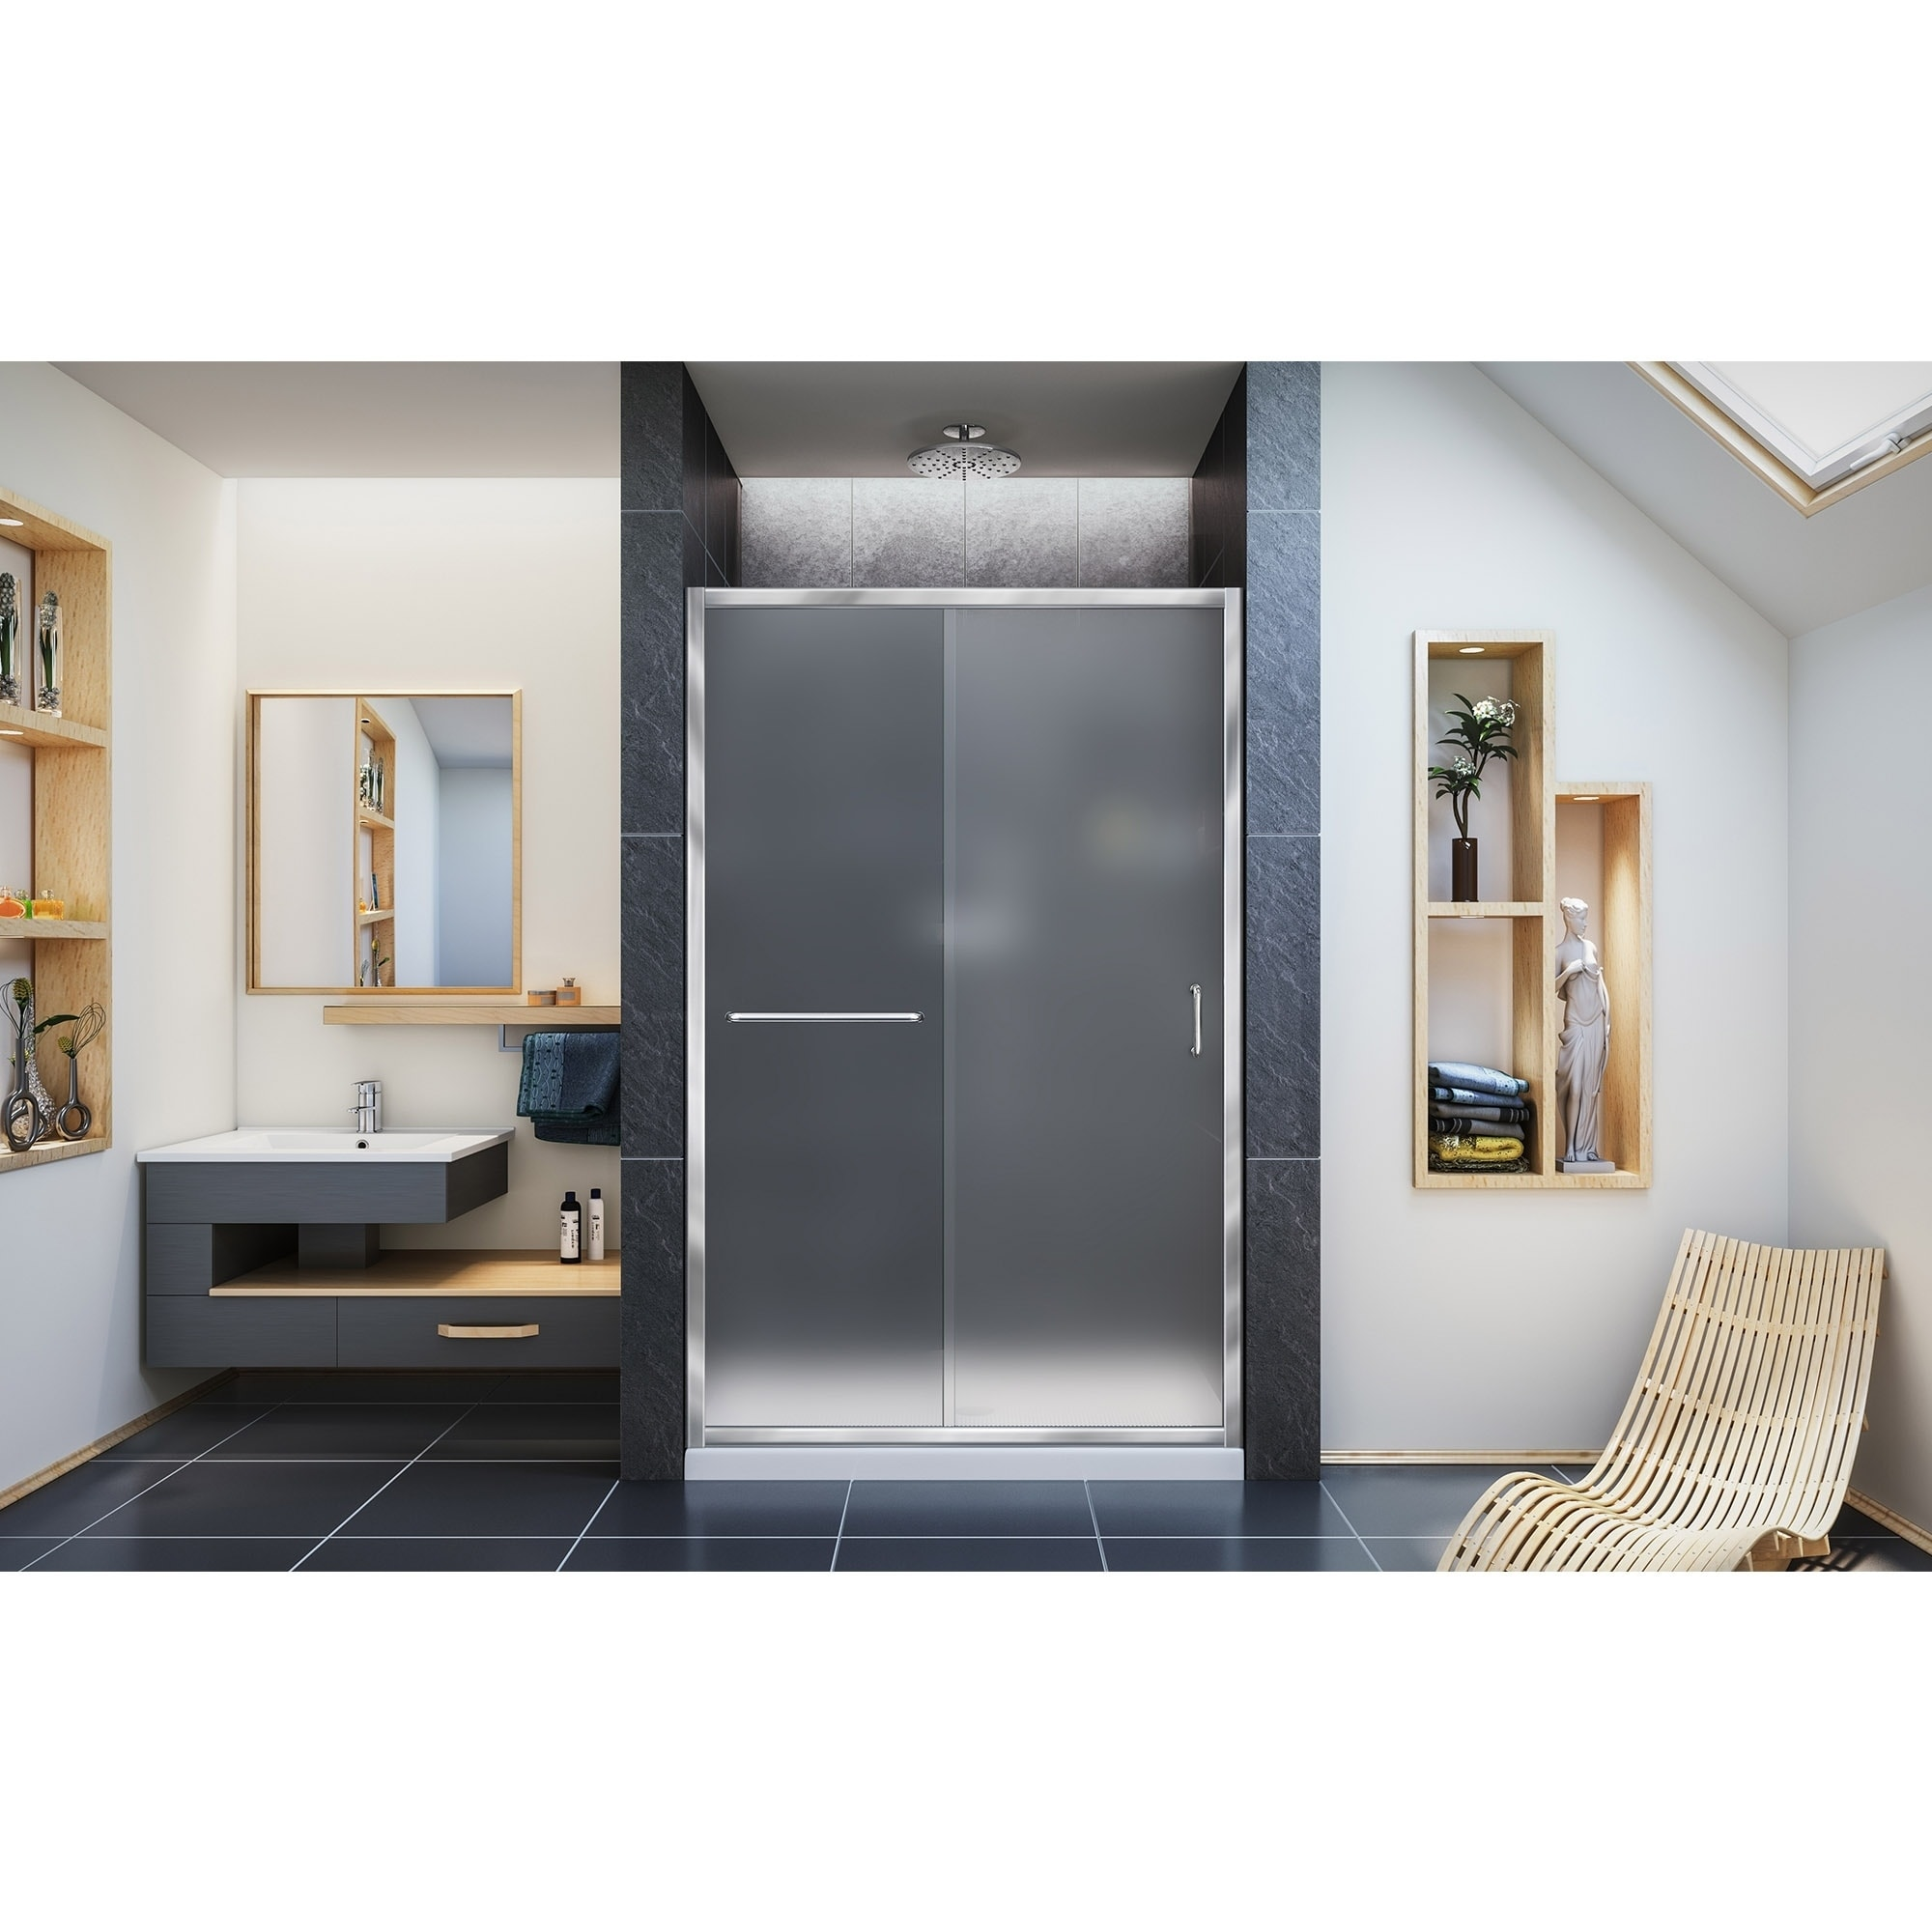 Details About Dreamline Infinity Z 44 48 In W X 72 In H Semi Frameless Sliding Shower Door